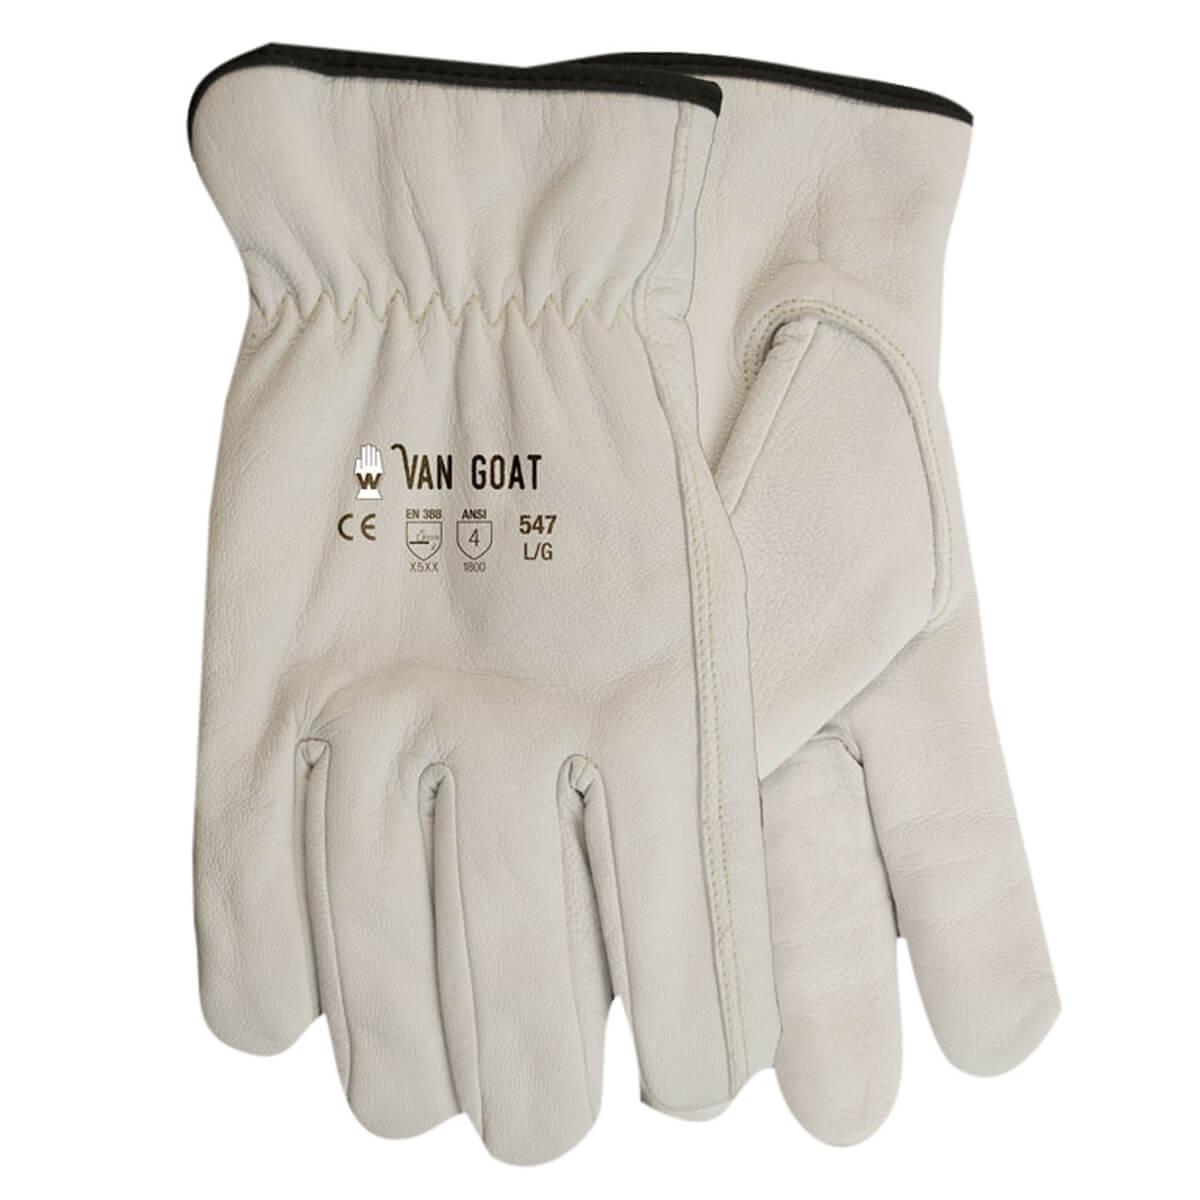 Van Goat Gloves